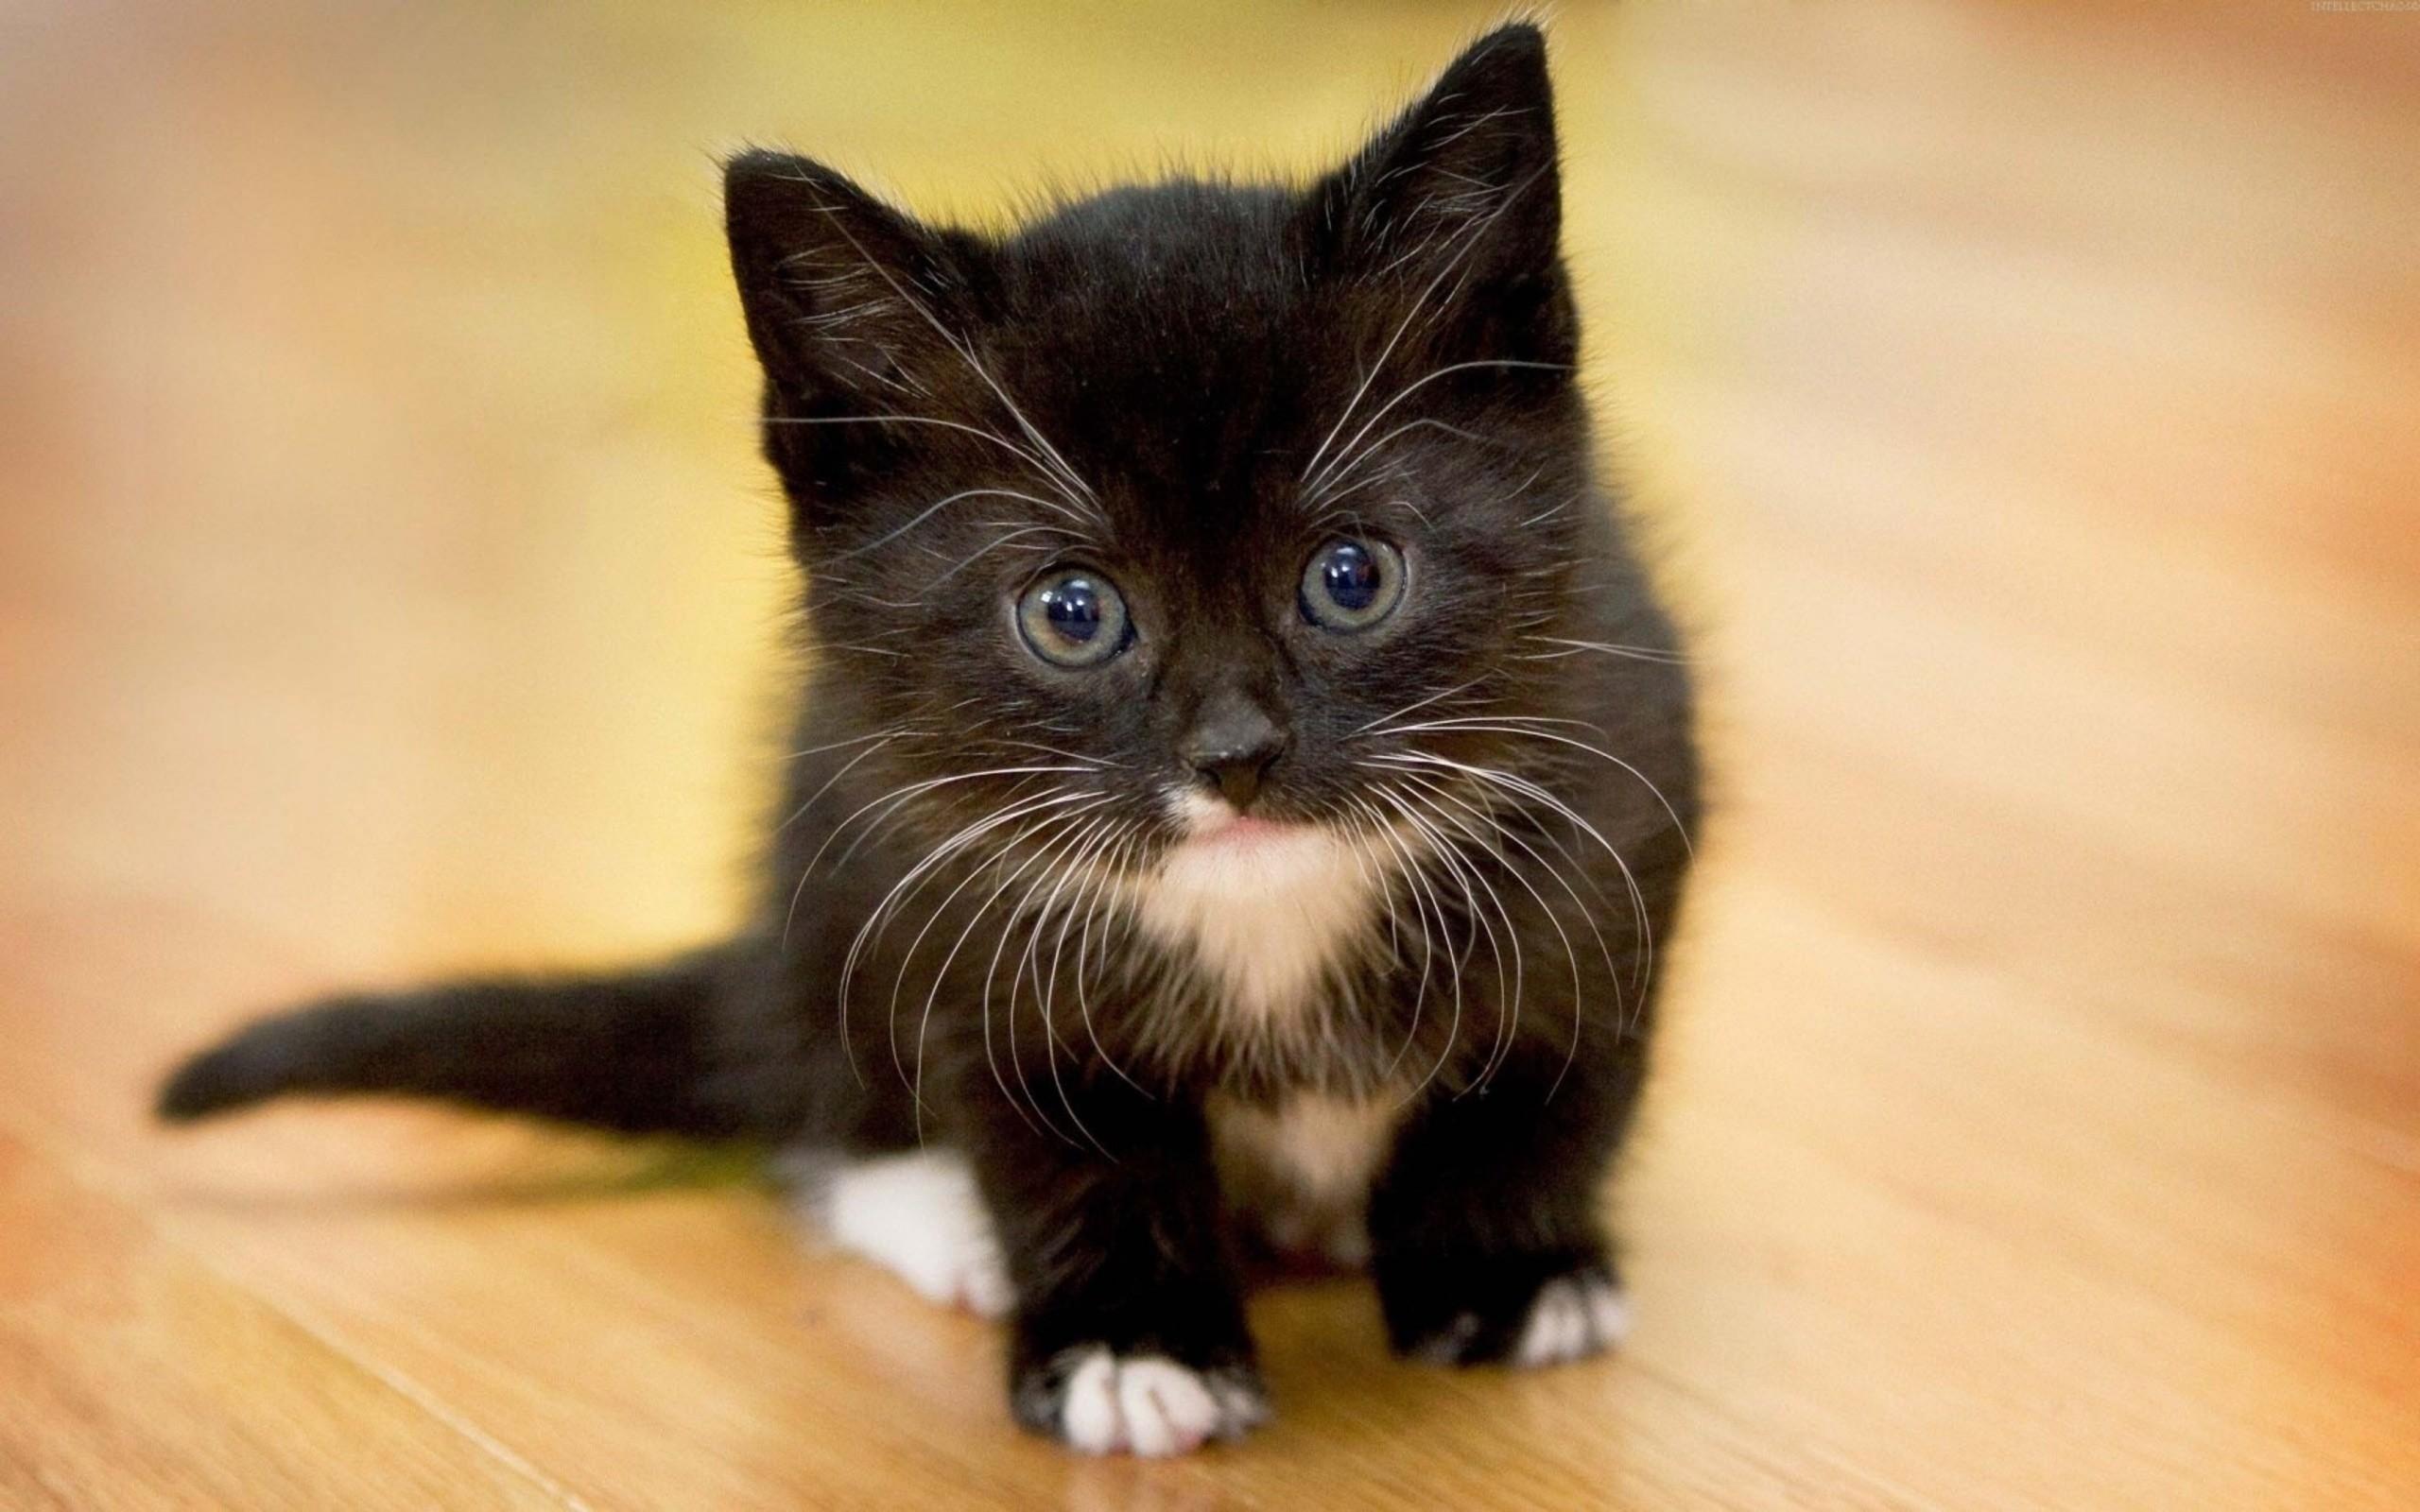 Un pequeño gato negro - 2560x1600